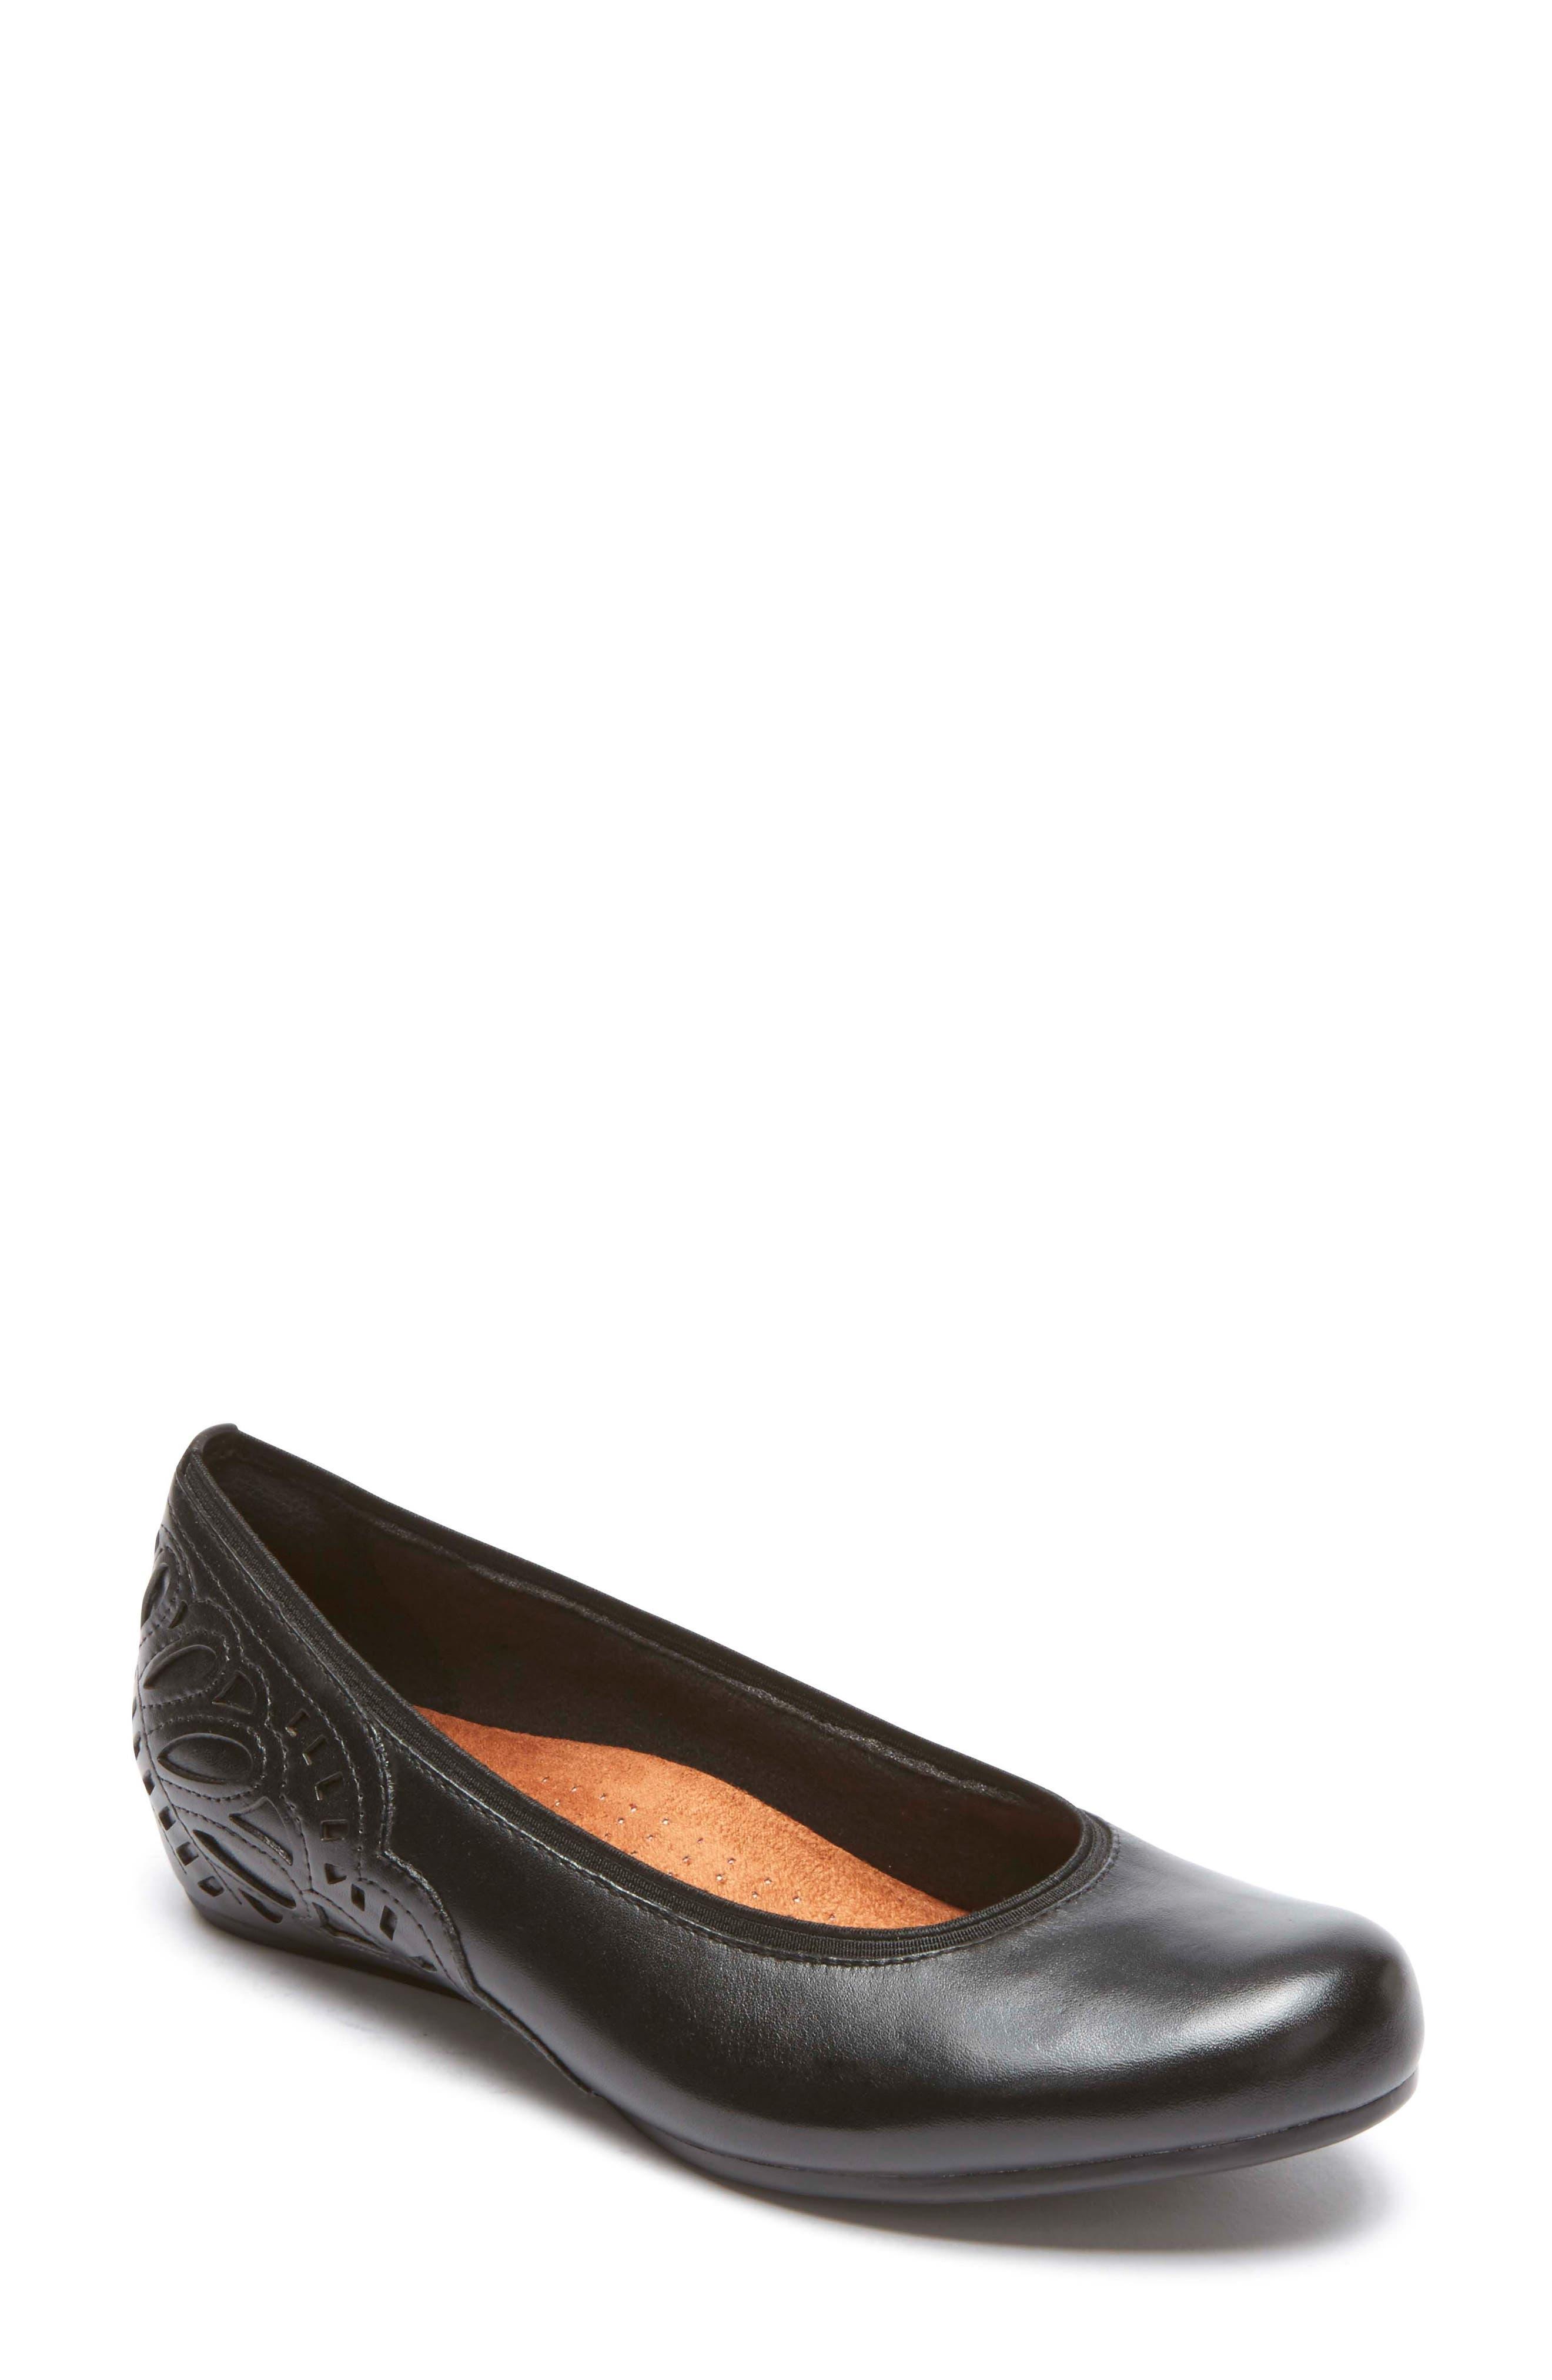 Sharleen Wedge Pump,                             Main thumbnail 1, color,                             Black Leather